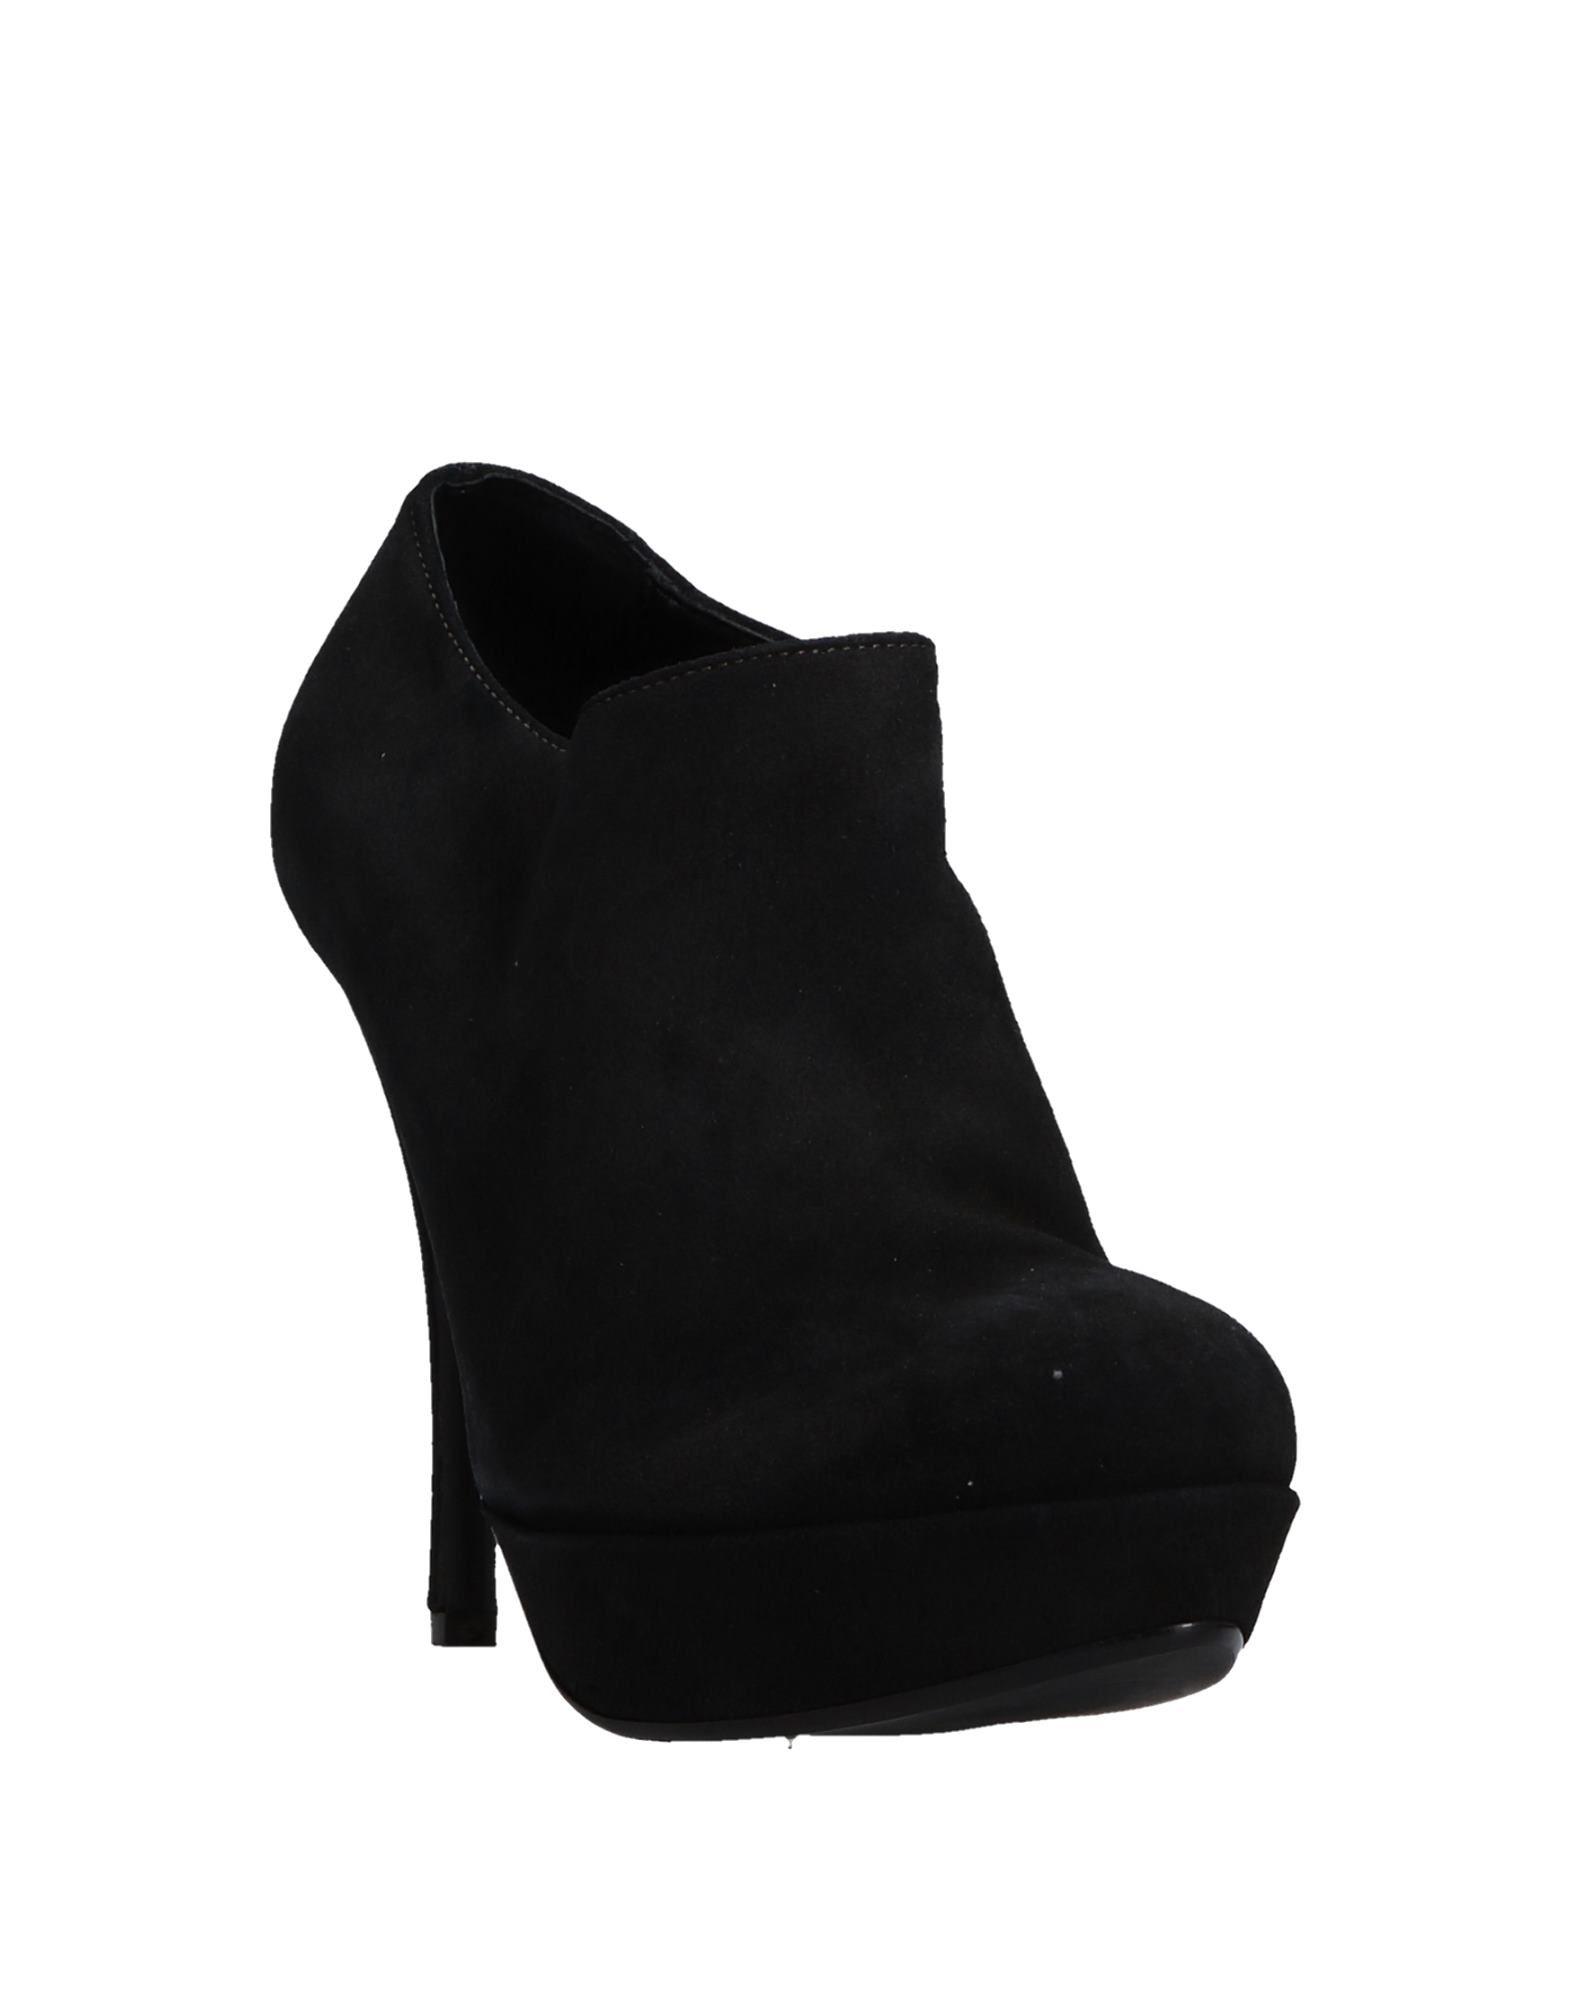 Tipe E Gute Tacchi Stiefelette Damen  11532828UP Gute E Qualität beliebte Schuhe d37b19